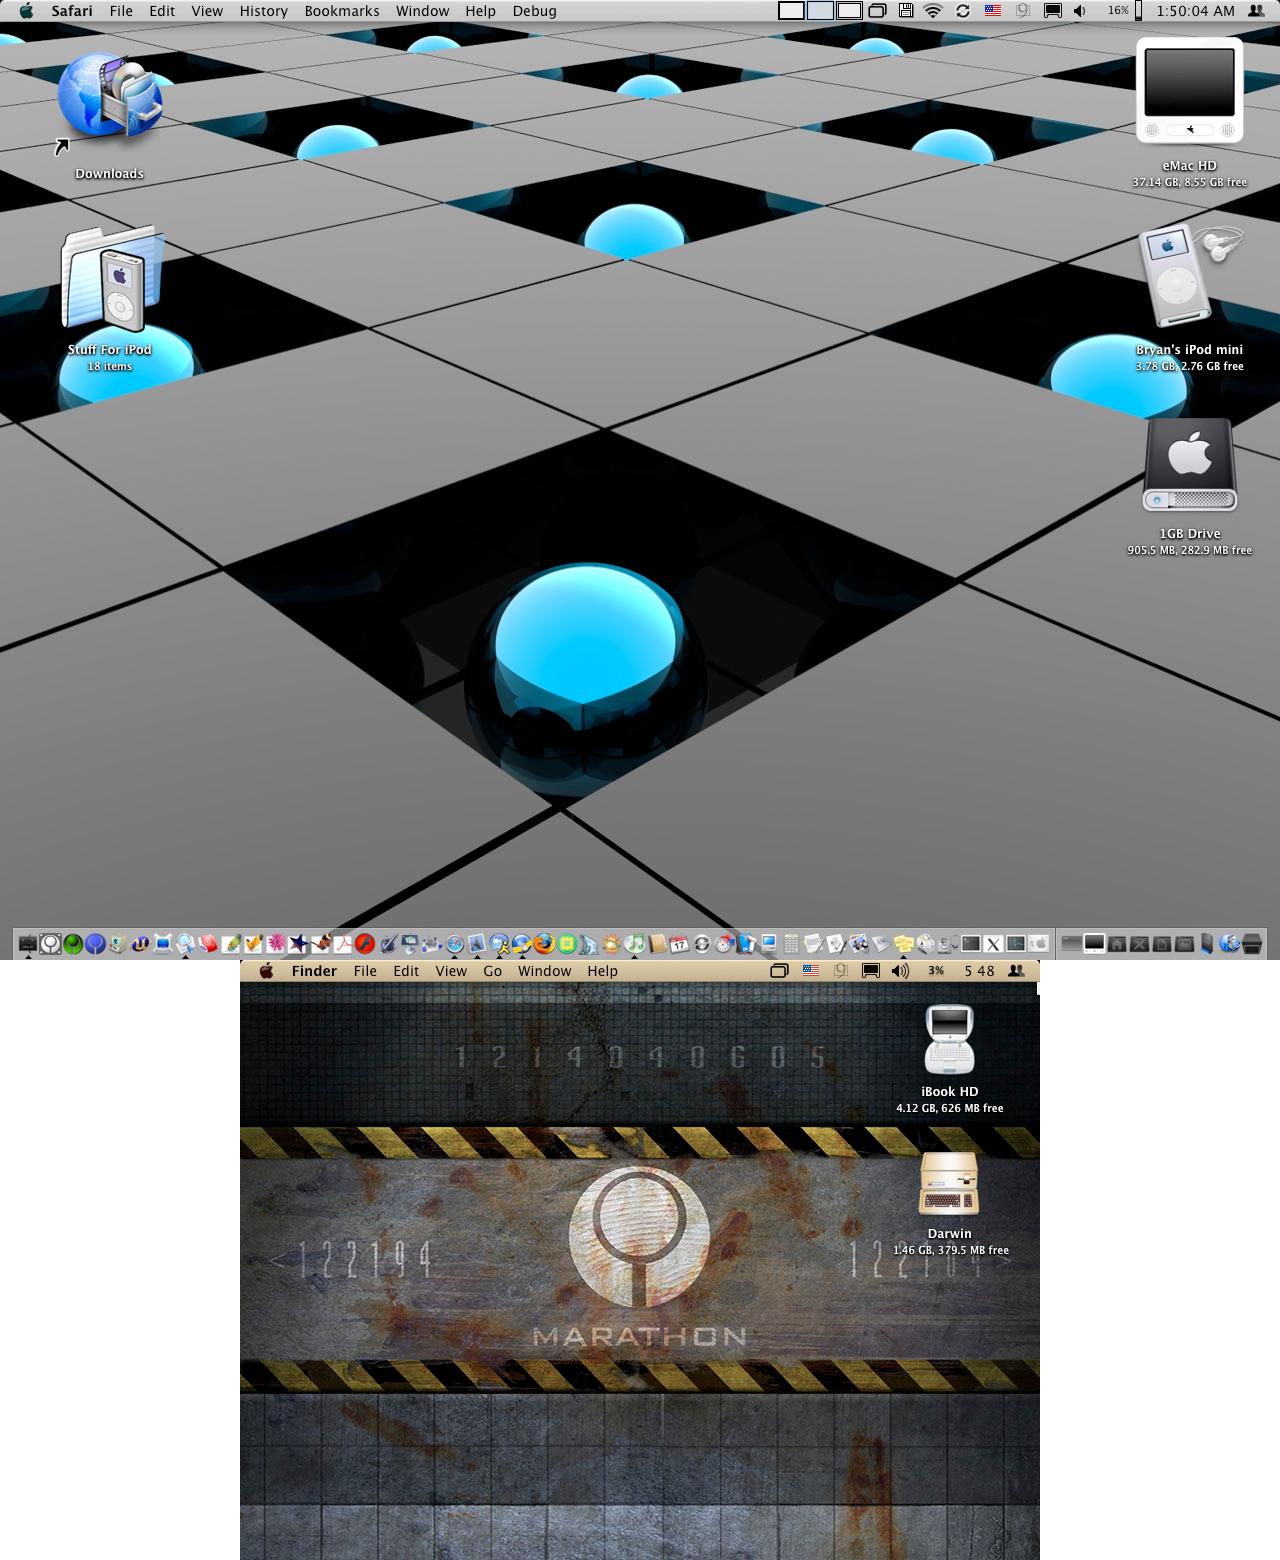 eMac + iBook Screenies, March by pakkman781